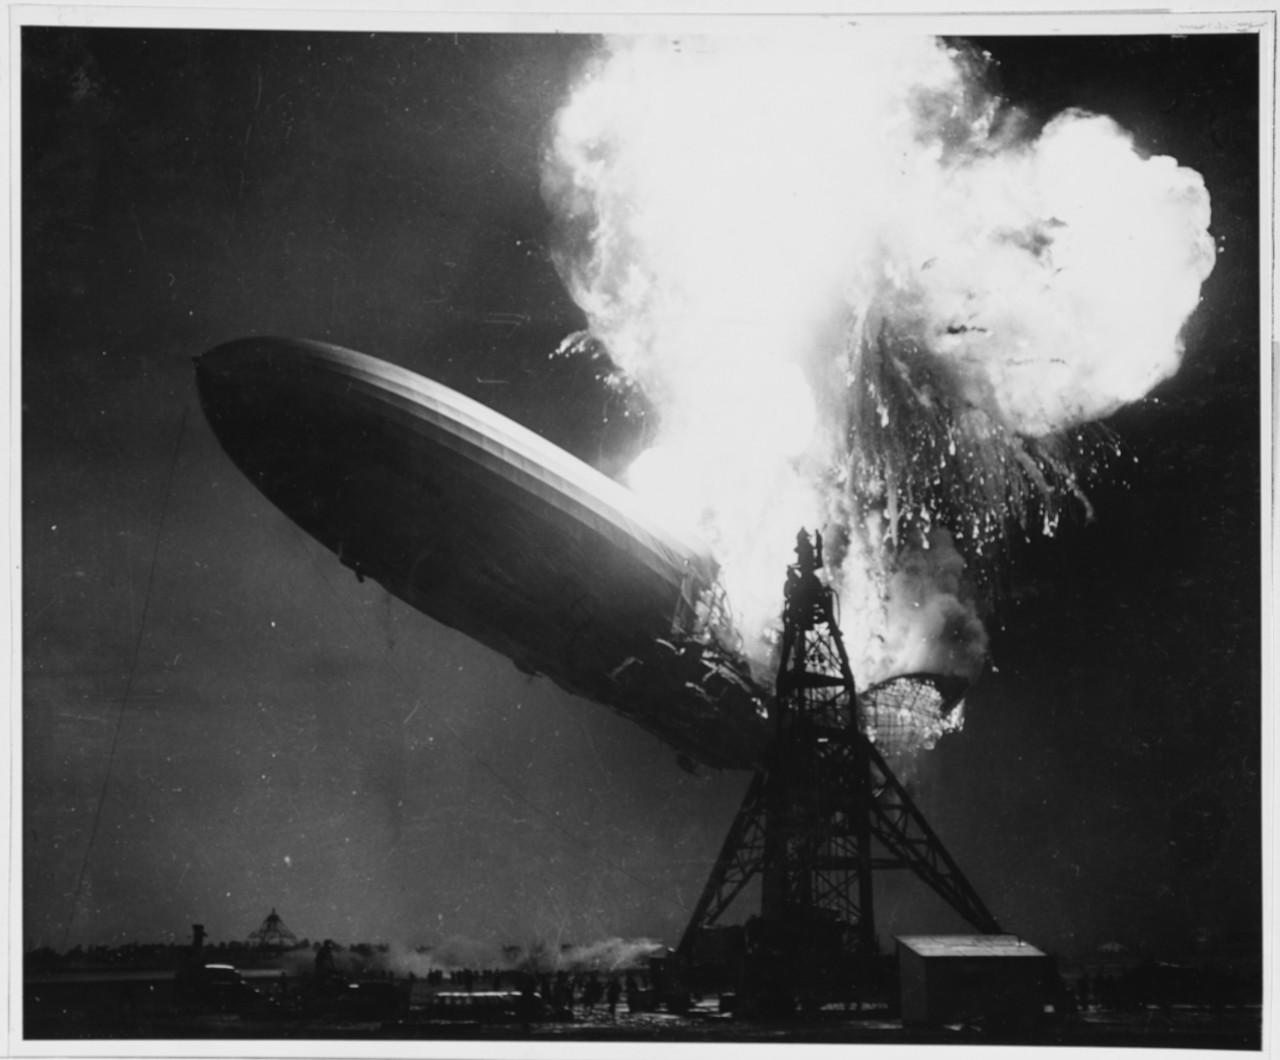 an introduction to the history of hindenburg On may 6, 1937, german airship hindenburg burst into flames, killing 35   photograph courtesy navy lakehurst historical society.